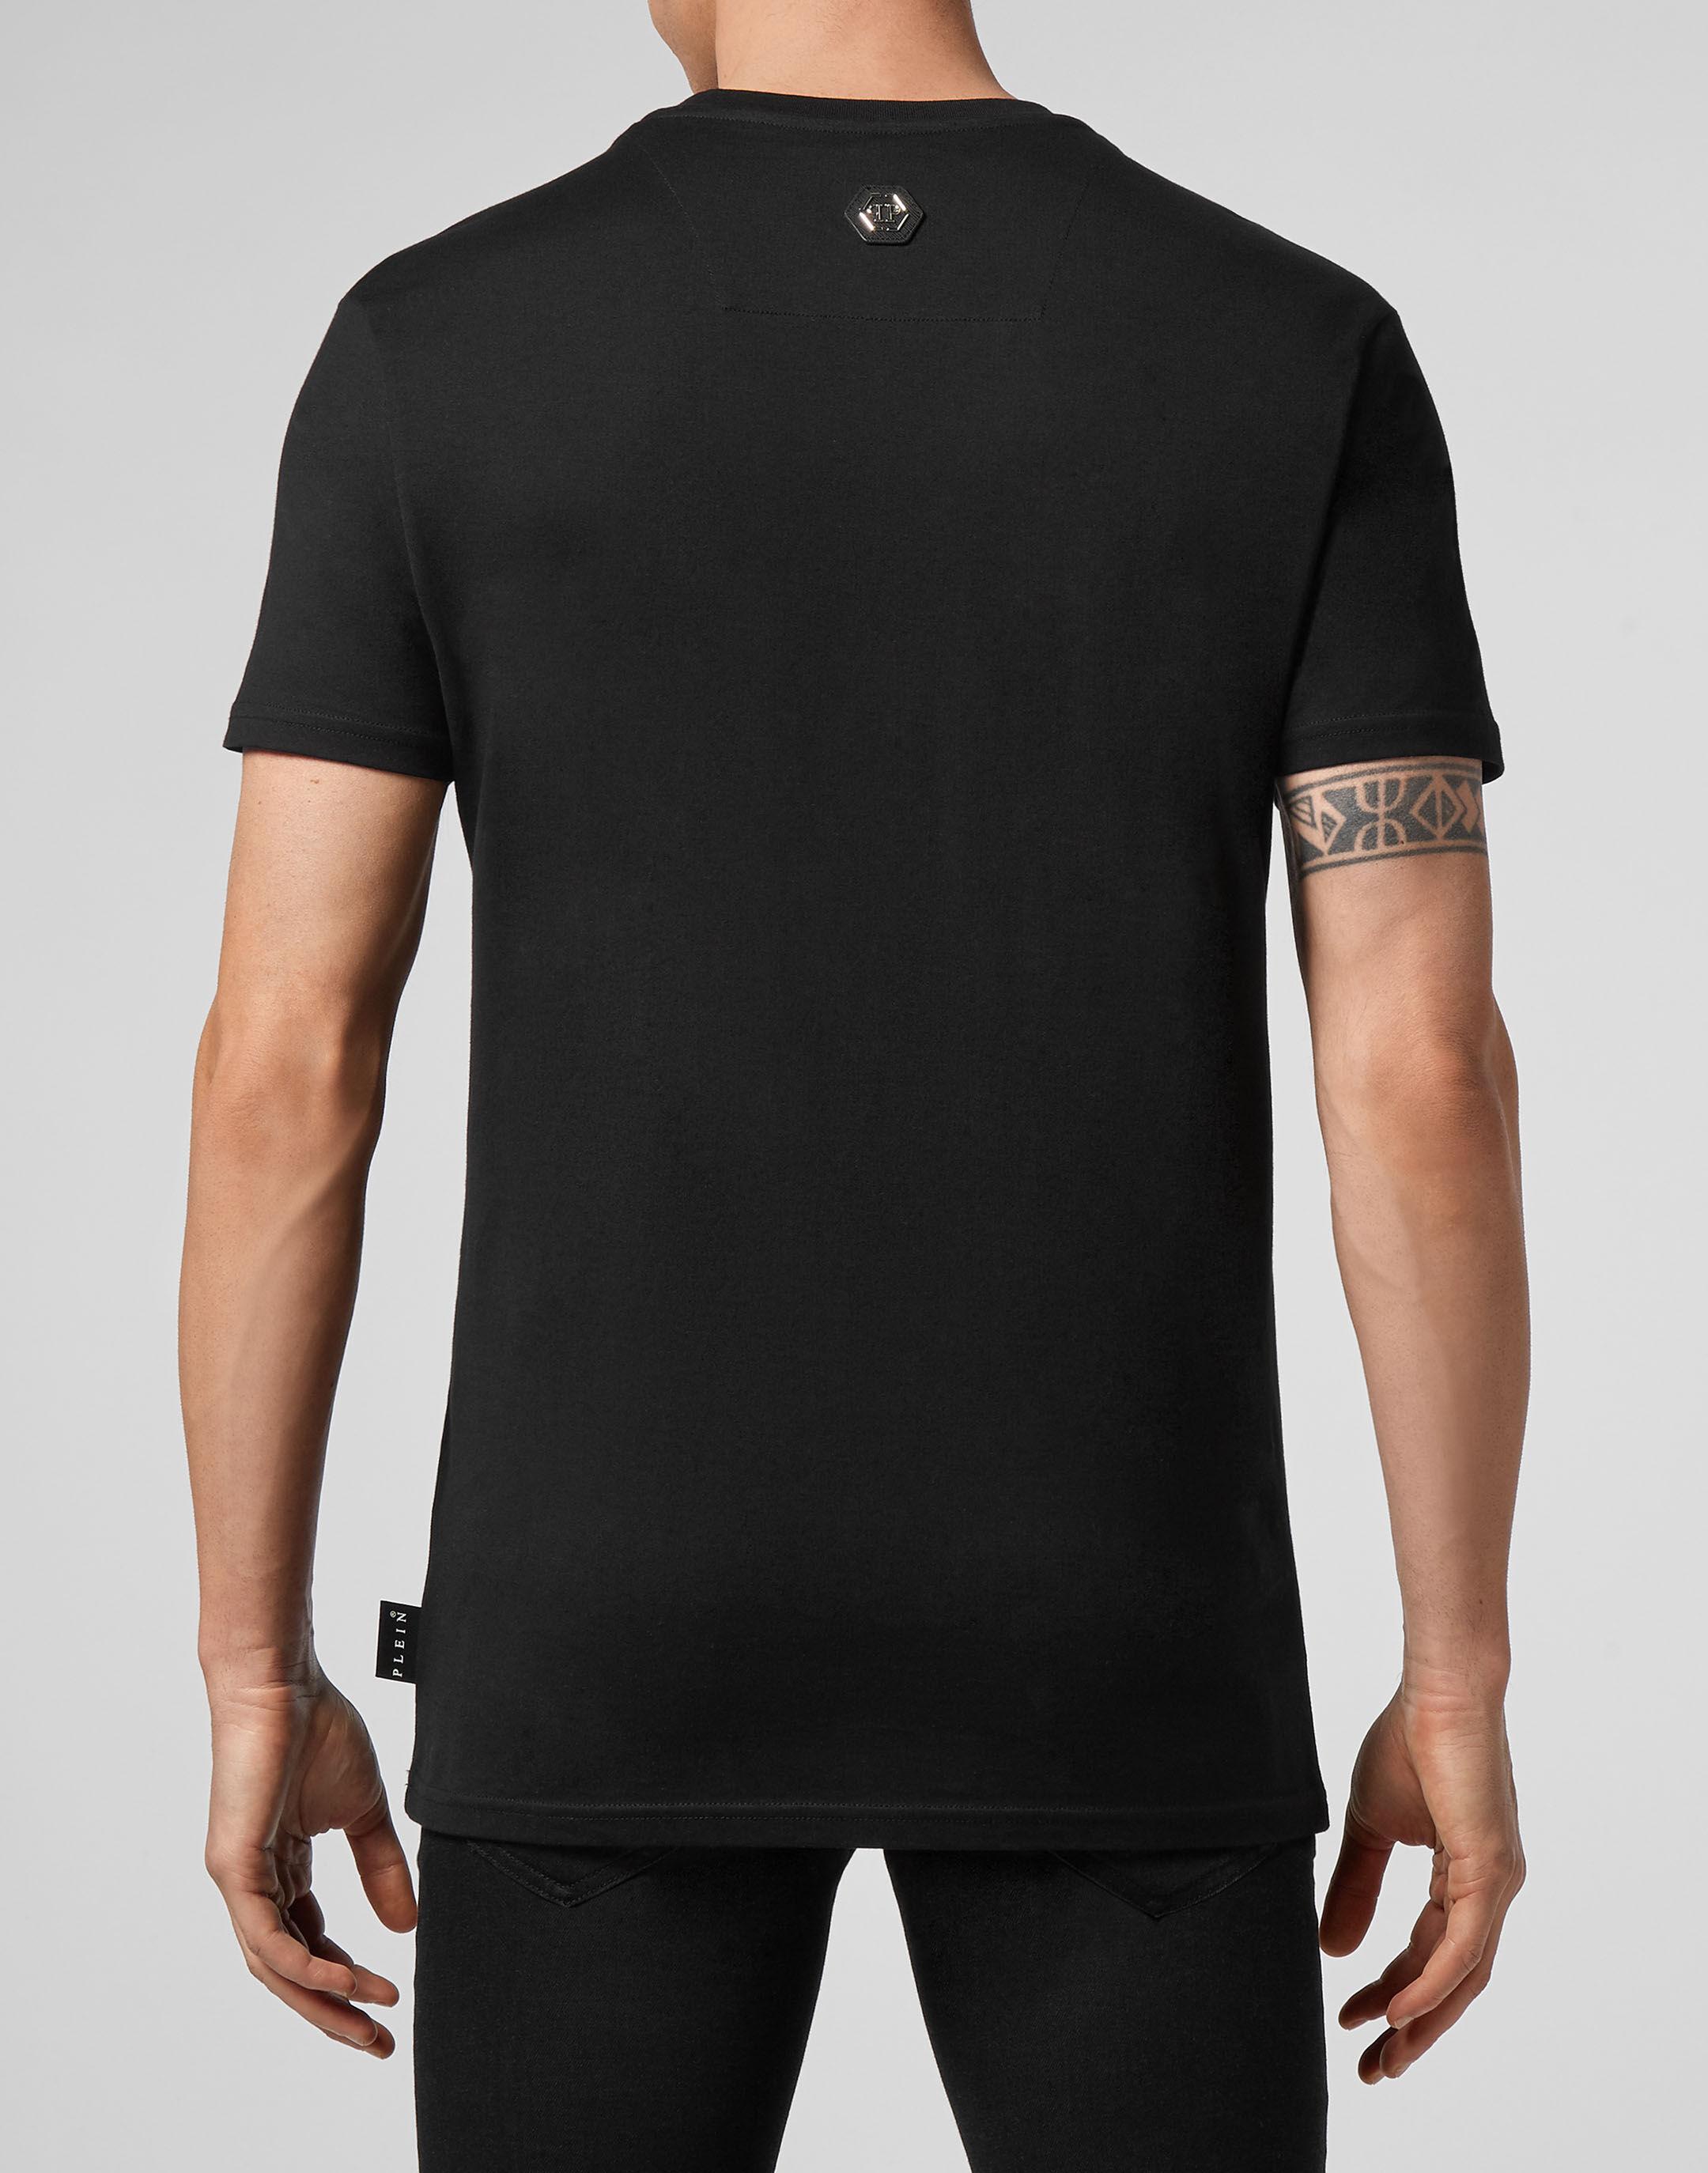 Zwart One Dollar Eye T skjorte   Local Fanatic   Basic t